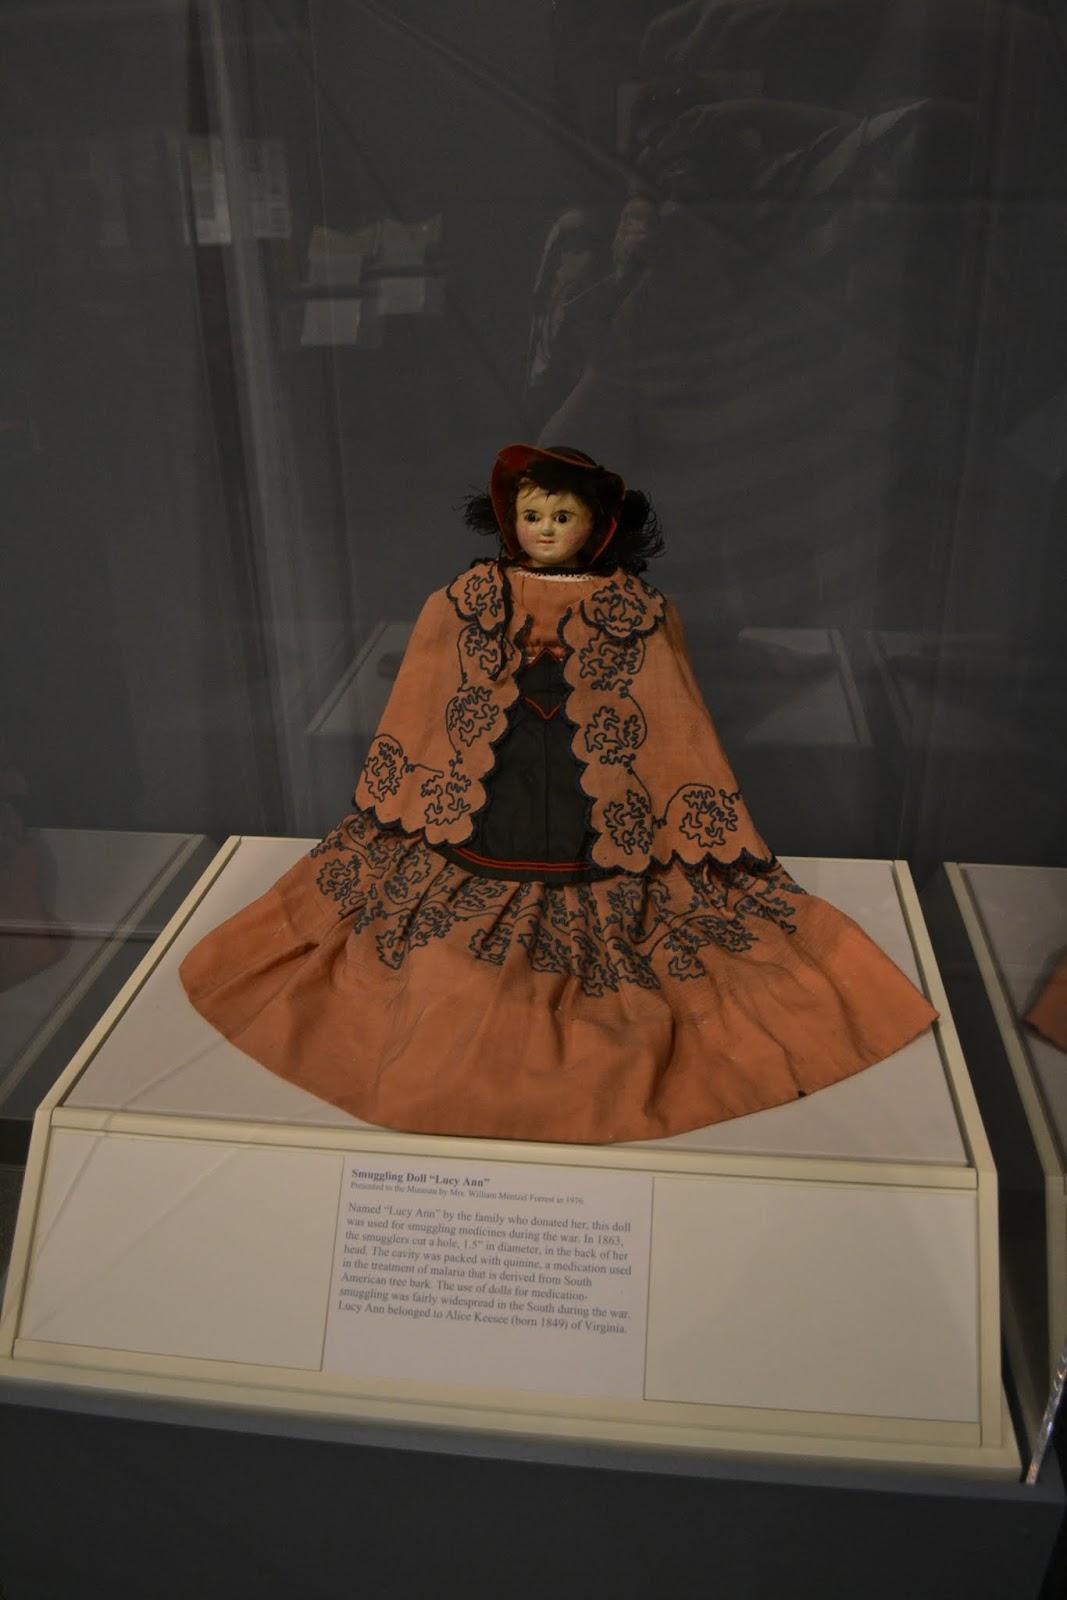 Музей Конфедерации, Ричмонд, Вирджиния (American Civil War Museum, Richmond, Virginia)